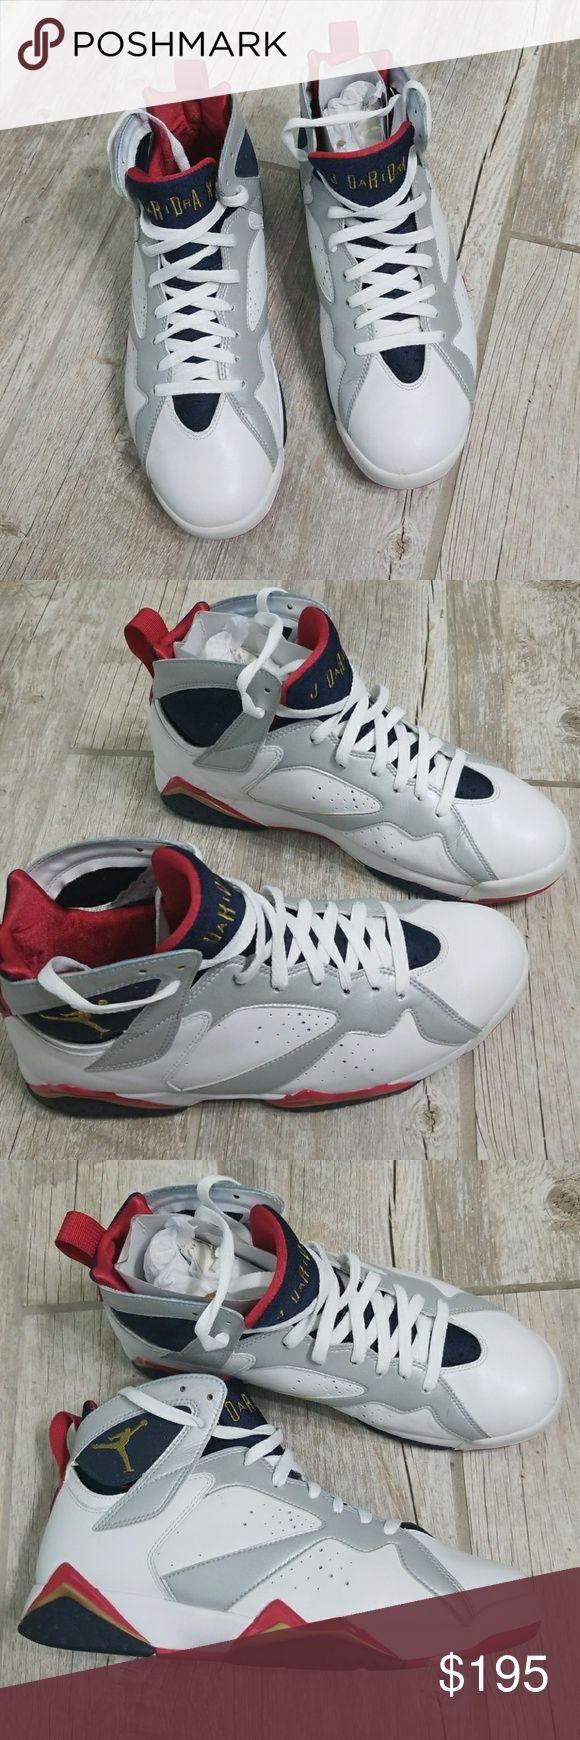 Jordan's 7 retro Jordan Olympic 7 gently used worn 3 times small scuff marks shown in pic original box. authentic Jordan's *No trades* Jordan Shoes Sneakers